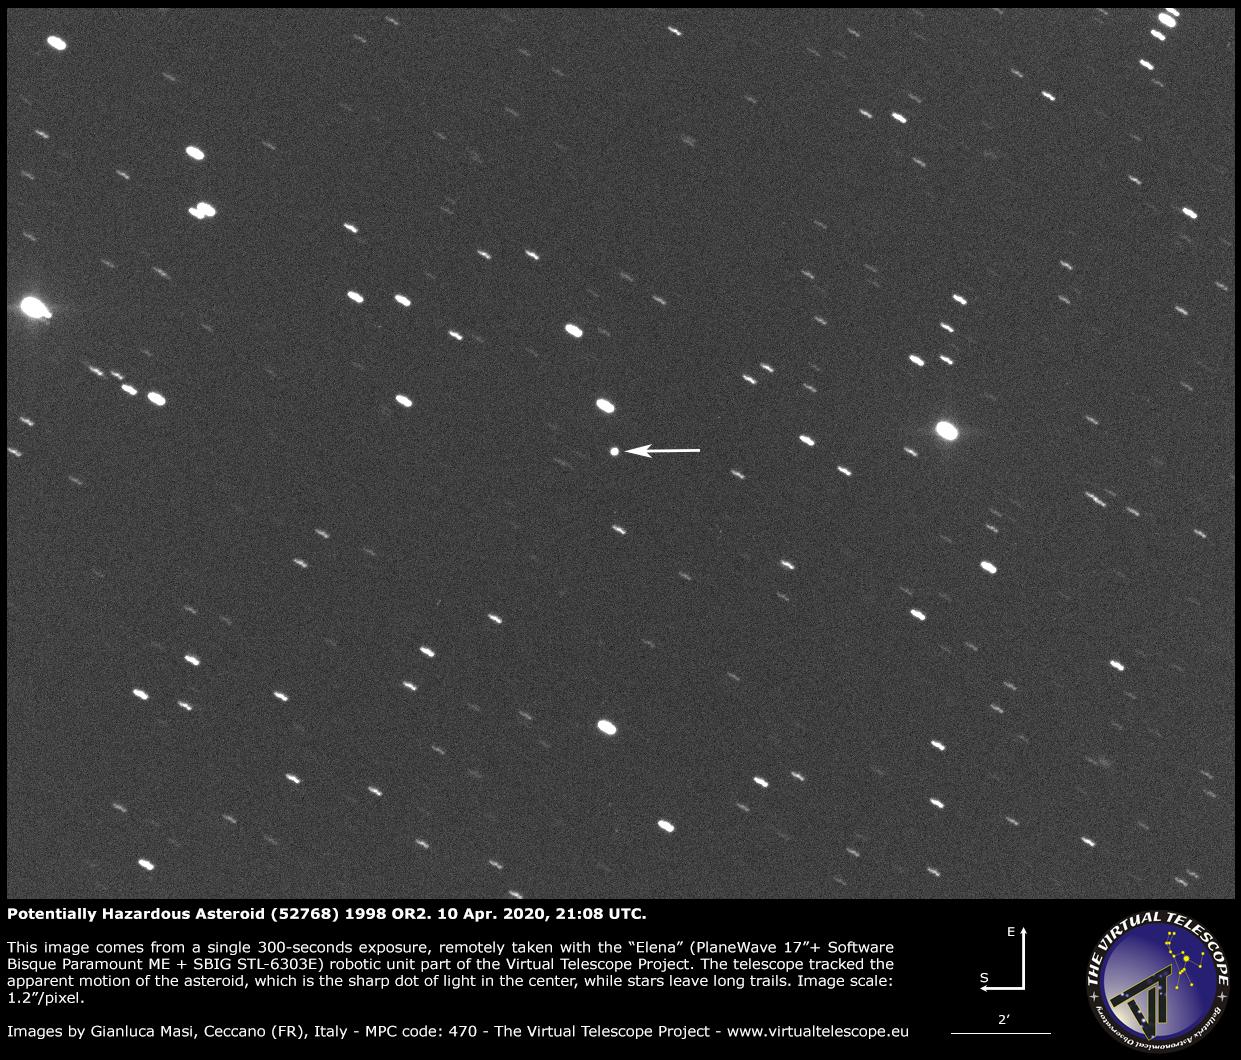 Potentially Hazardous Asteroid (52768) 1998 OR2: a image - 10 Apr. 2020